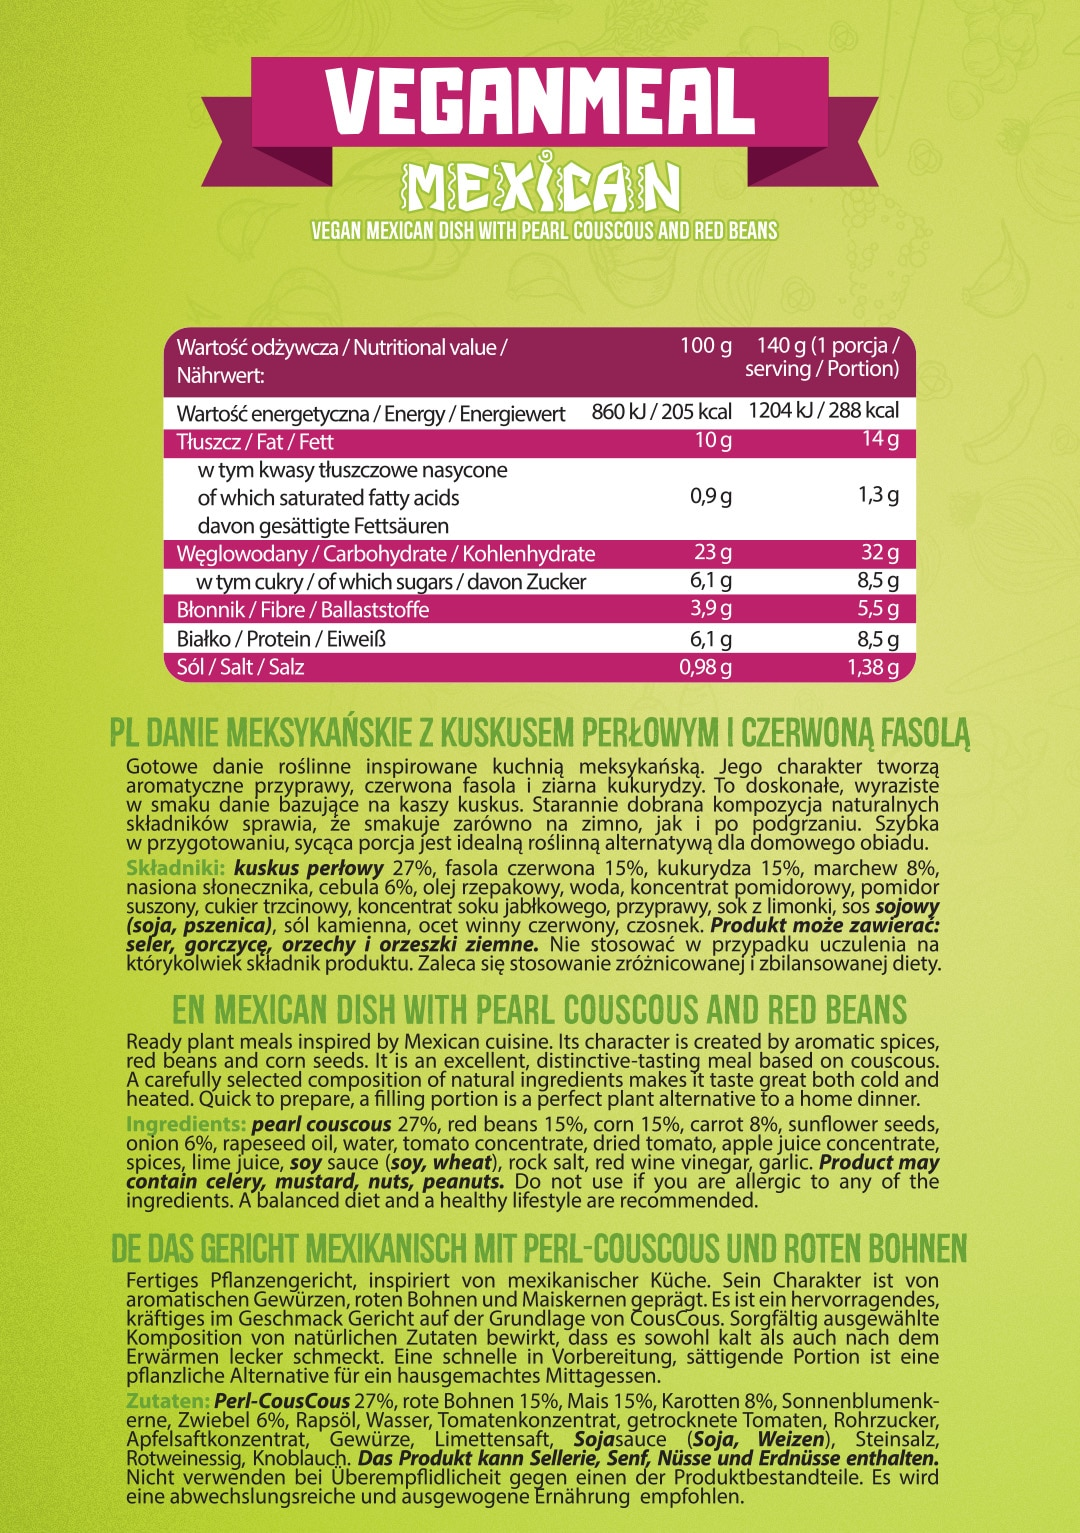 vegan-meal-mexican-allnutrition